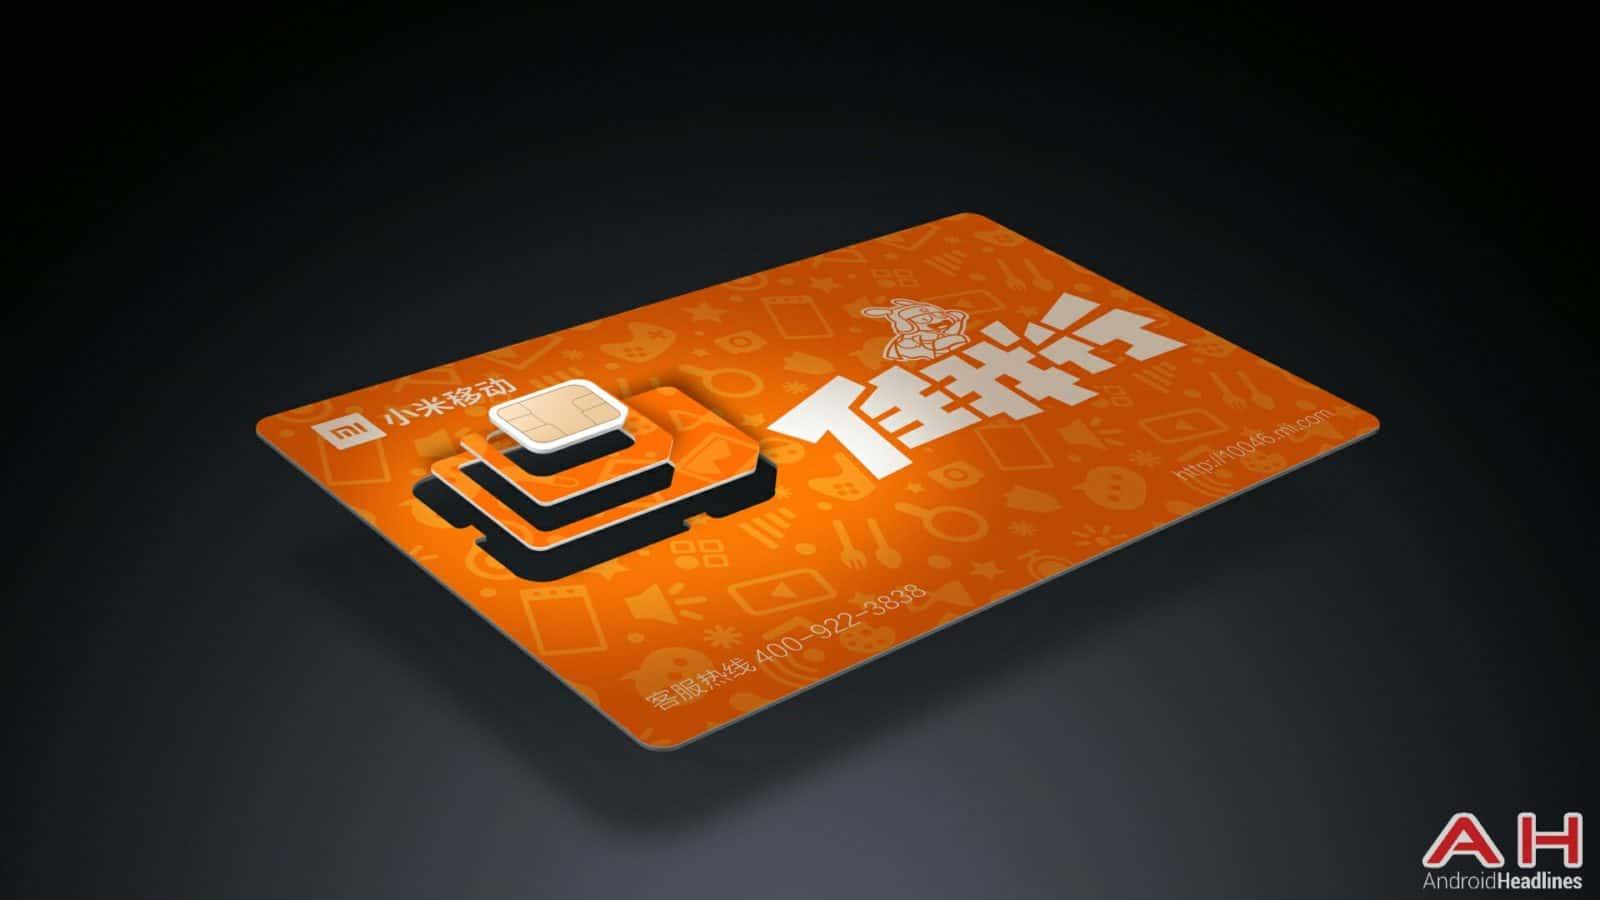 Xiaomi Mi Mobile_1 AH